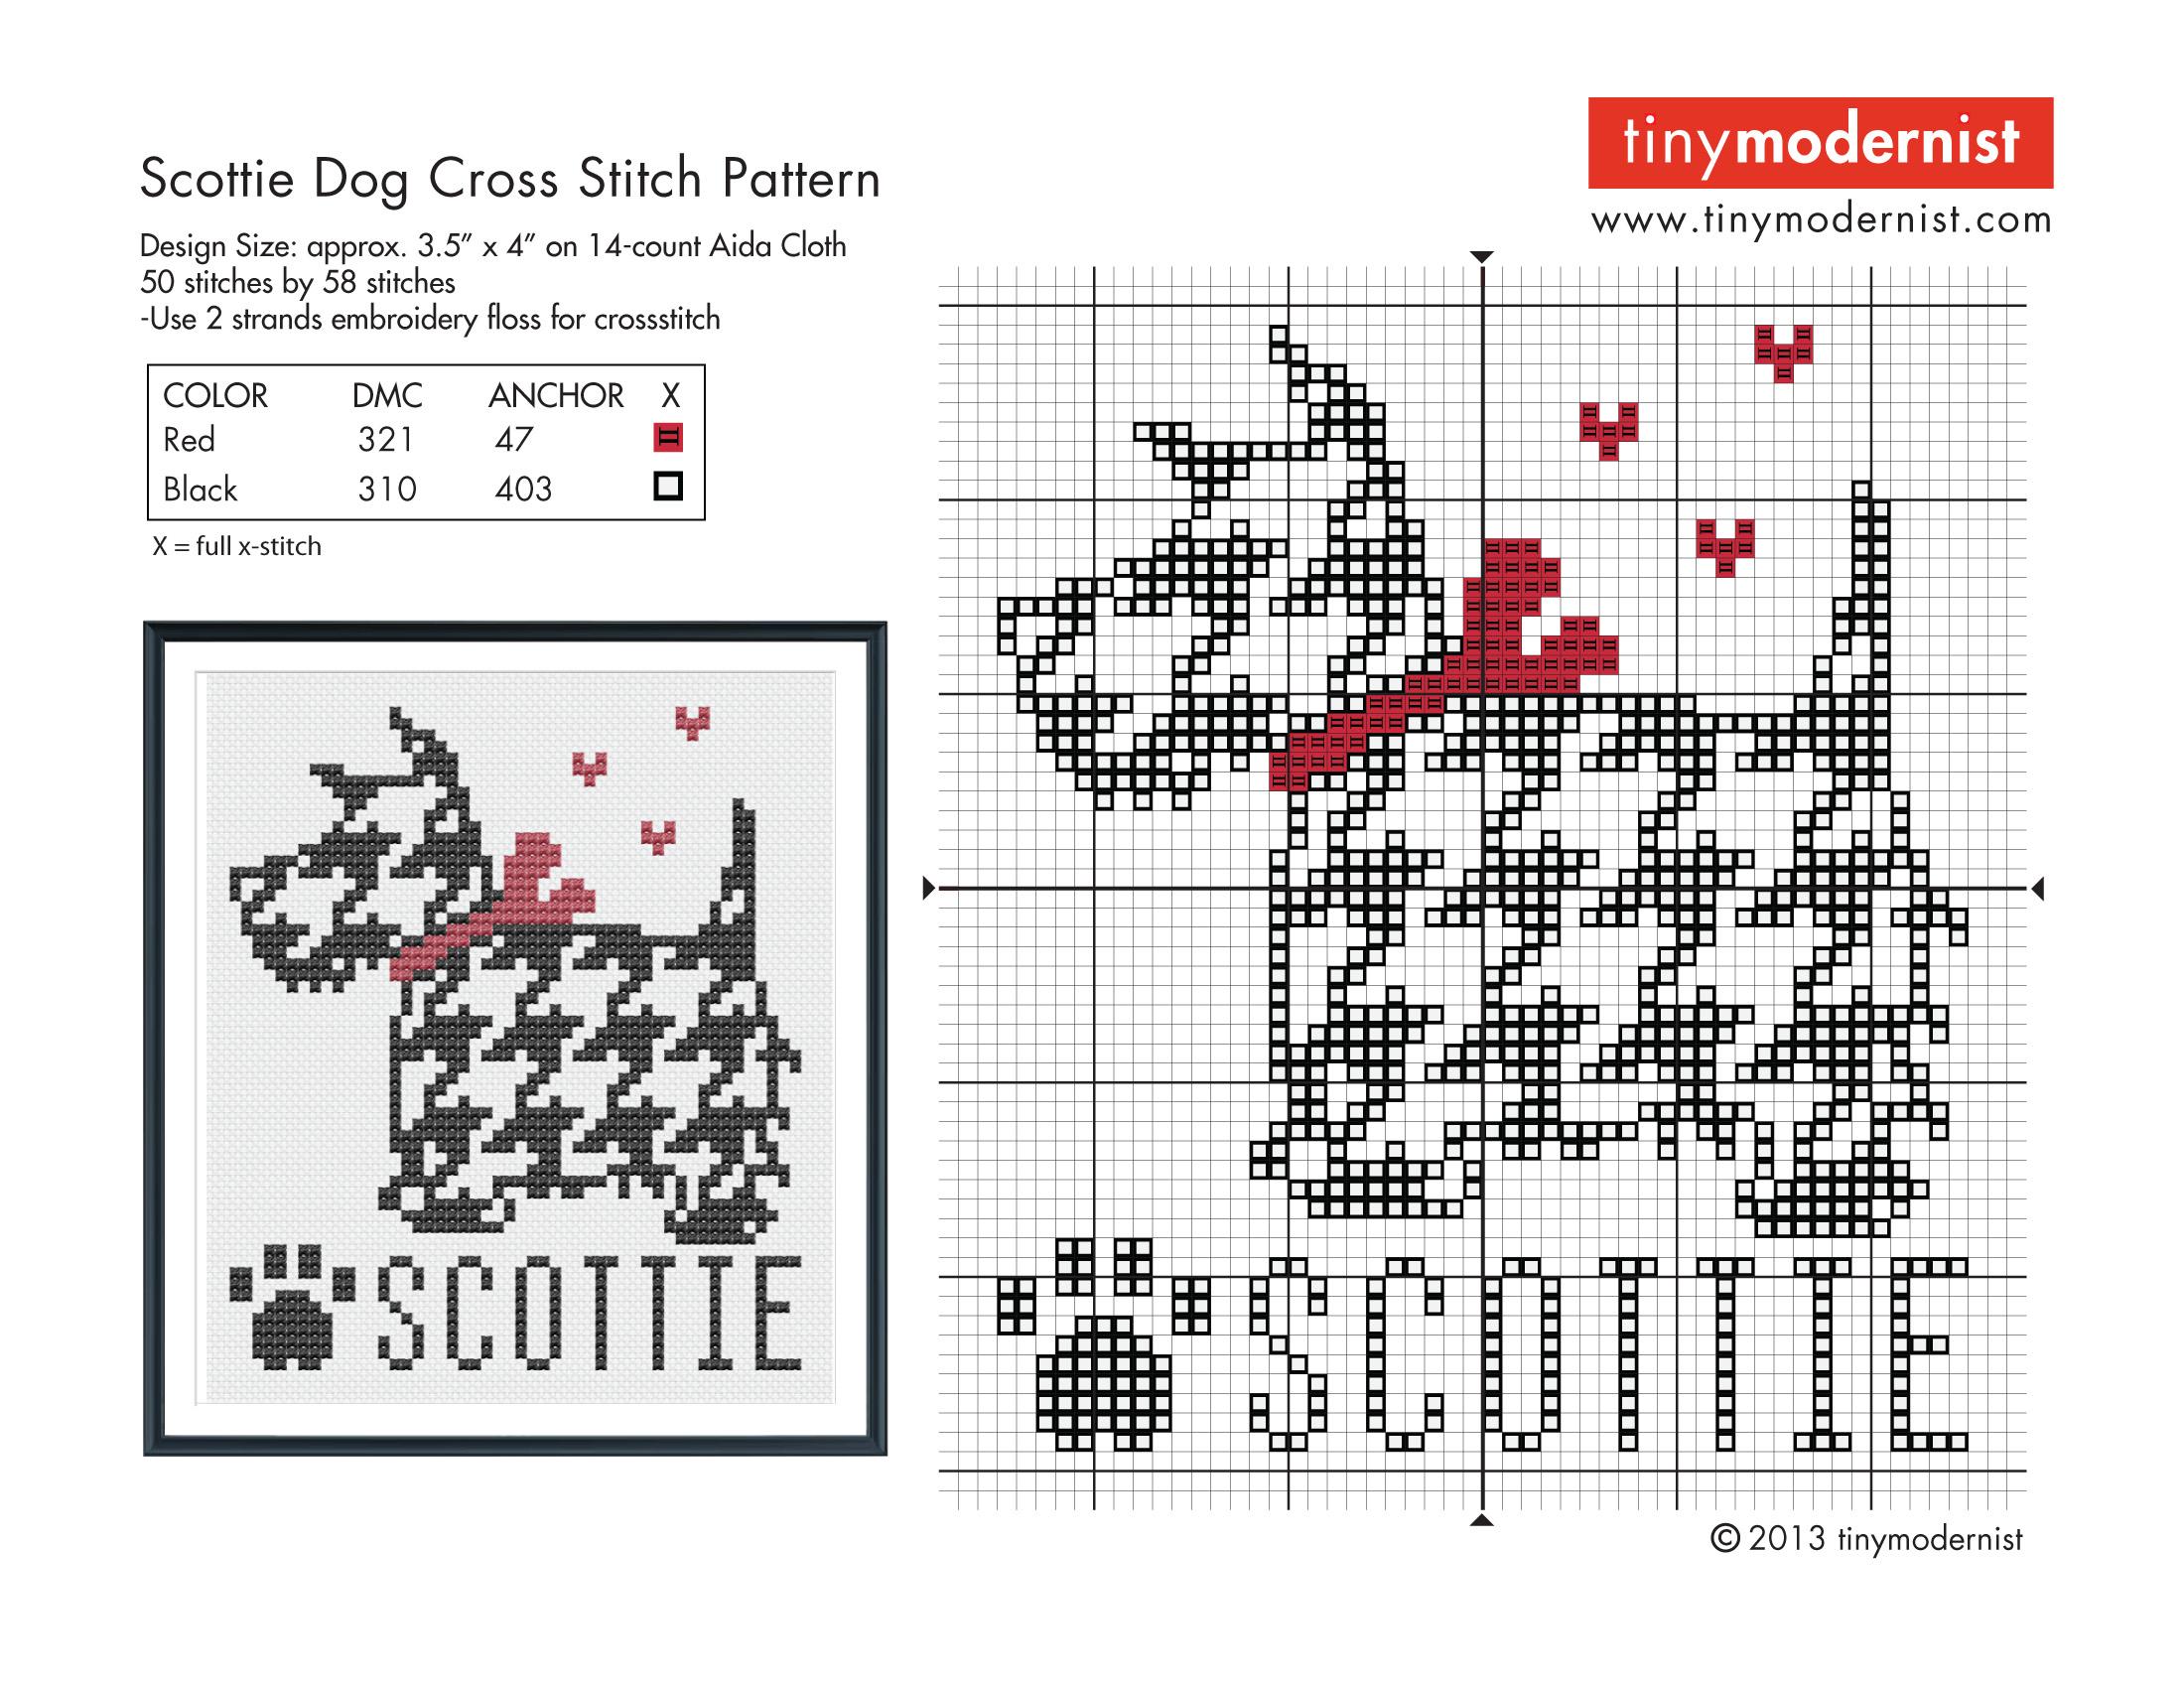 Free Cross Stitch Patterns | Tiny Modernist Cross Stitch Blog - Free Printable Modern Cross Stitch Patterns